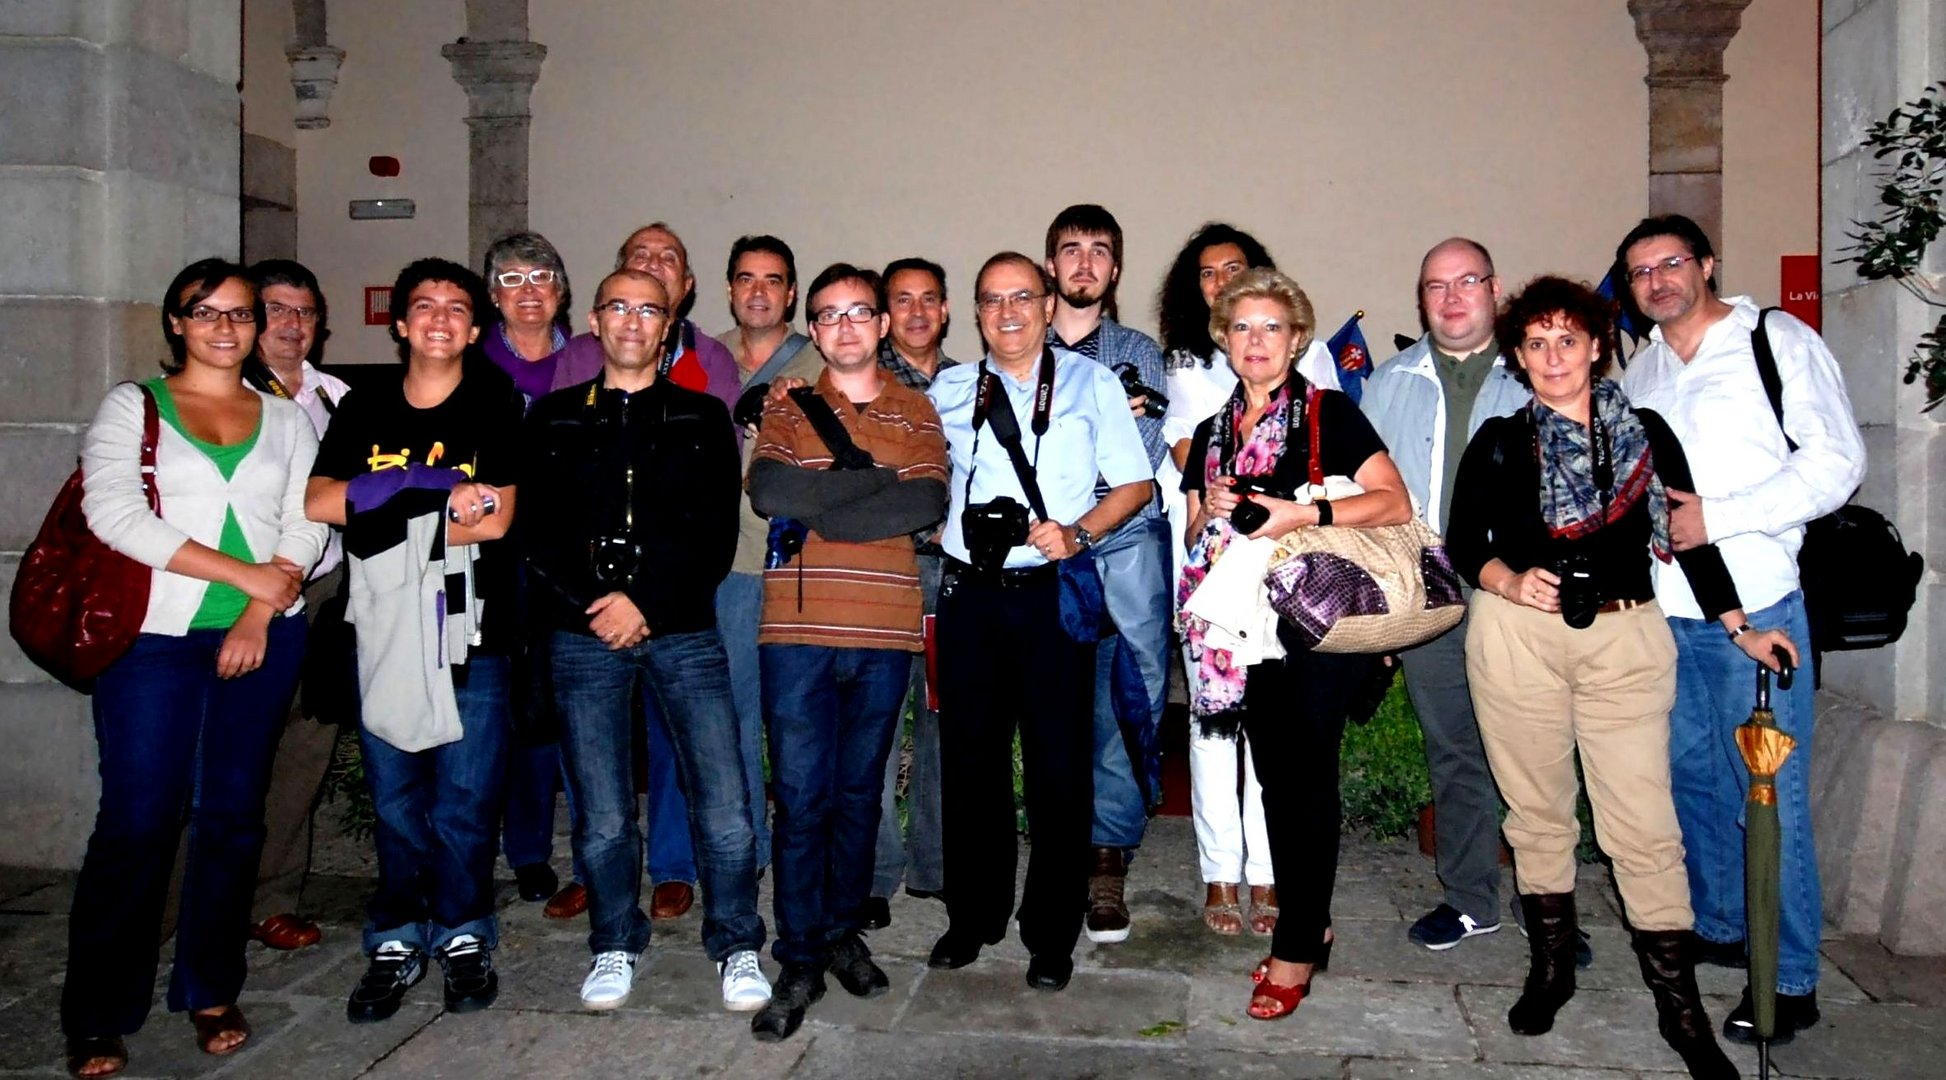 Cita Fotocommunity en Barcelona